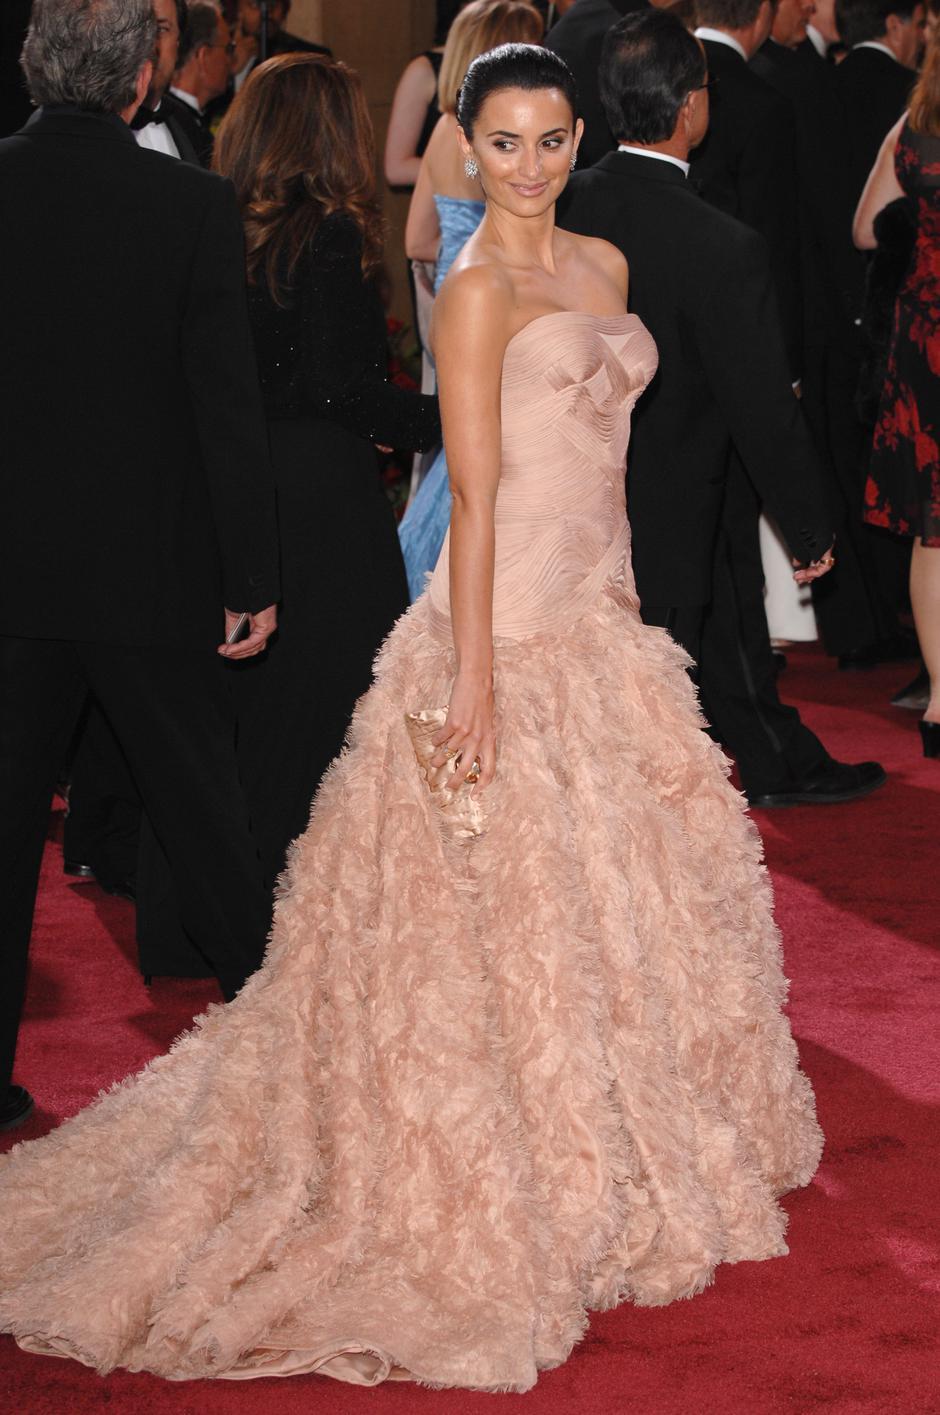 Penelope Cruz, dodjela Oscara | Autor: Shutterstock